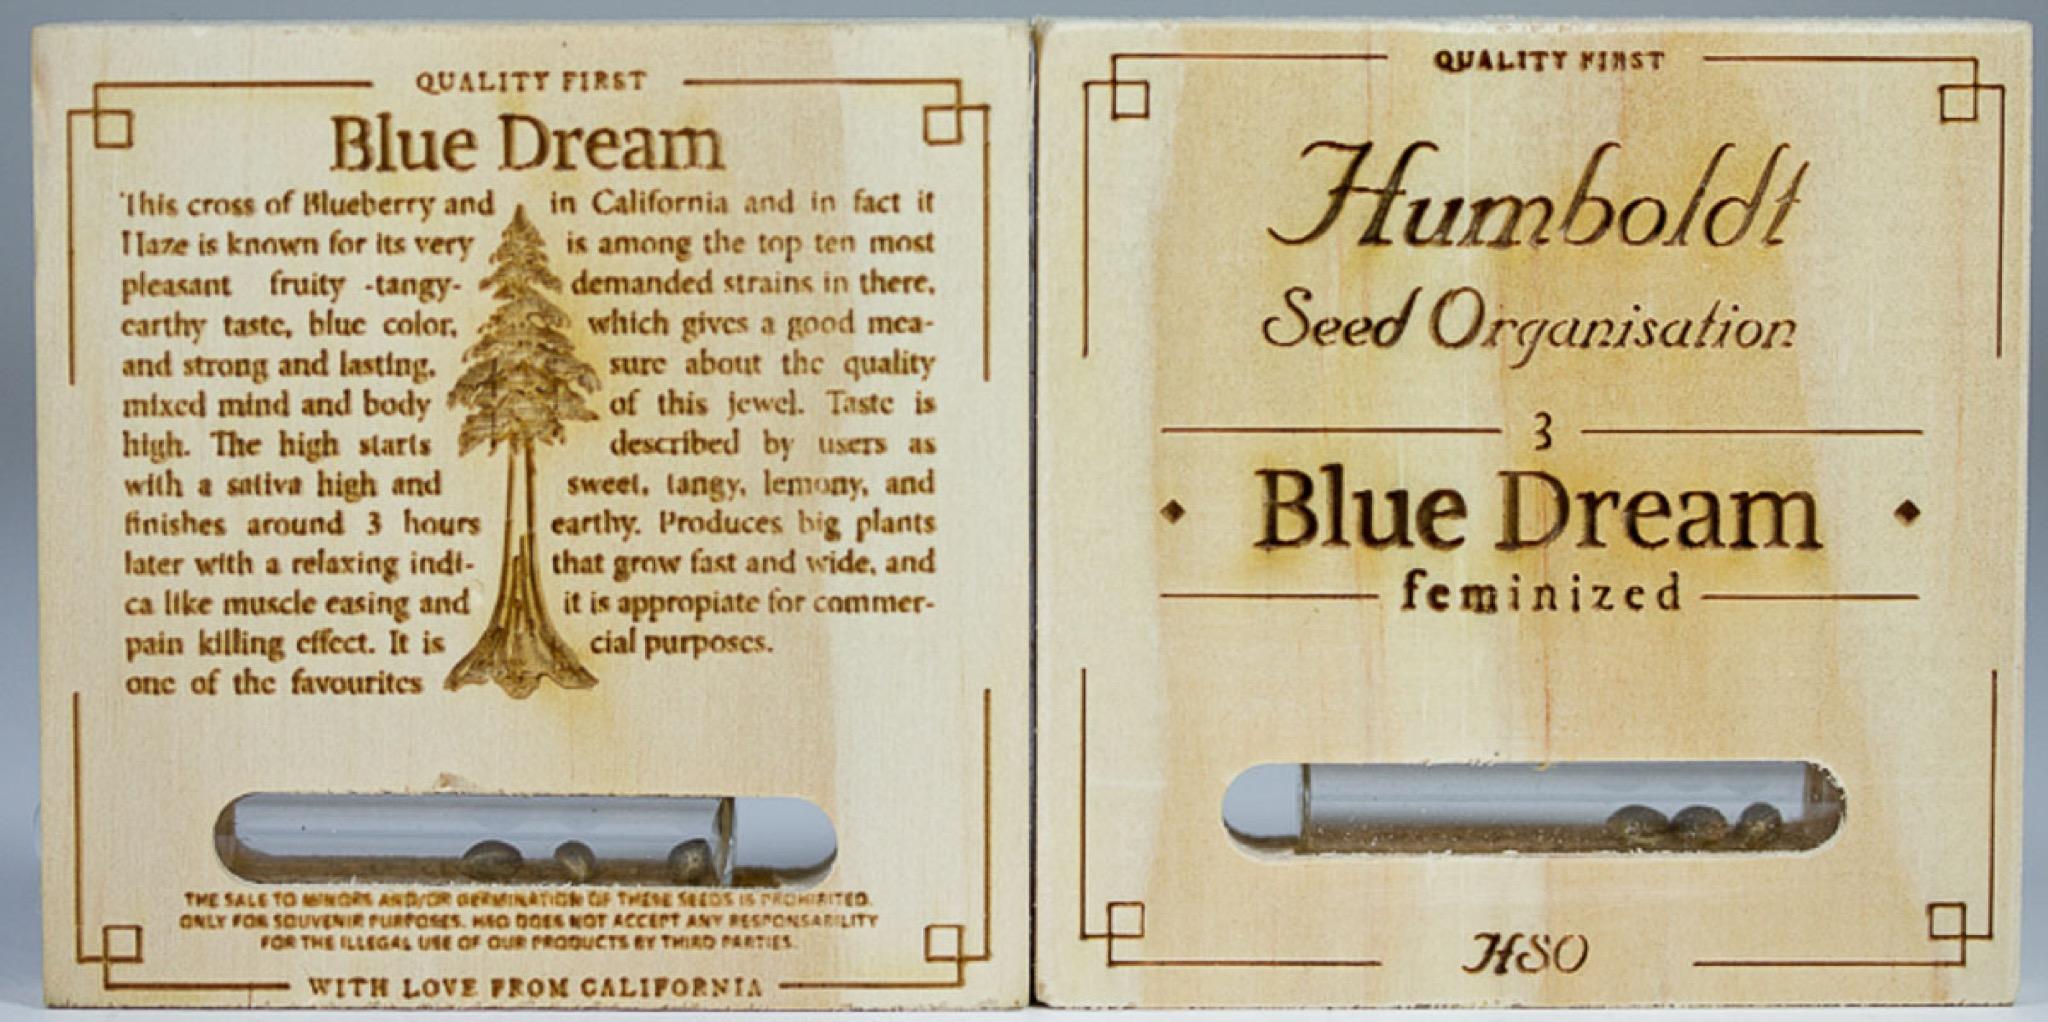 HSO Packaging (Photo Gallery) - Humboldt Seeds UK